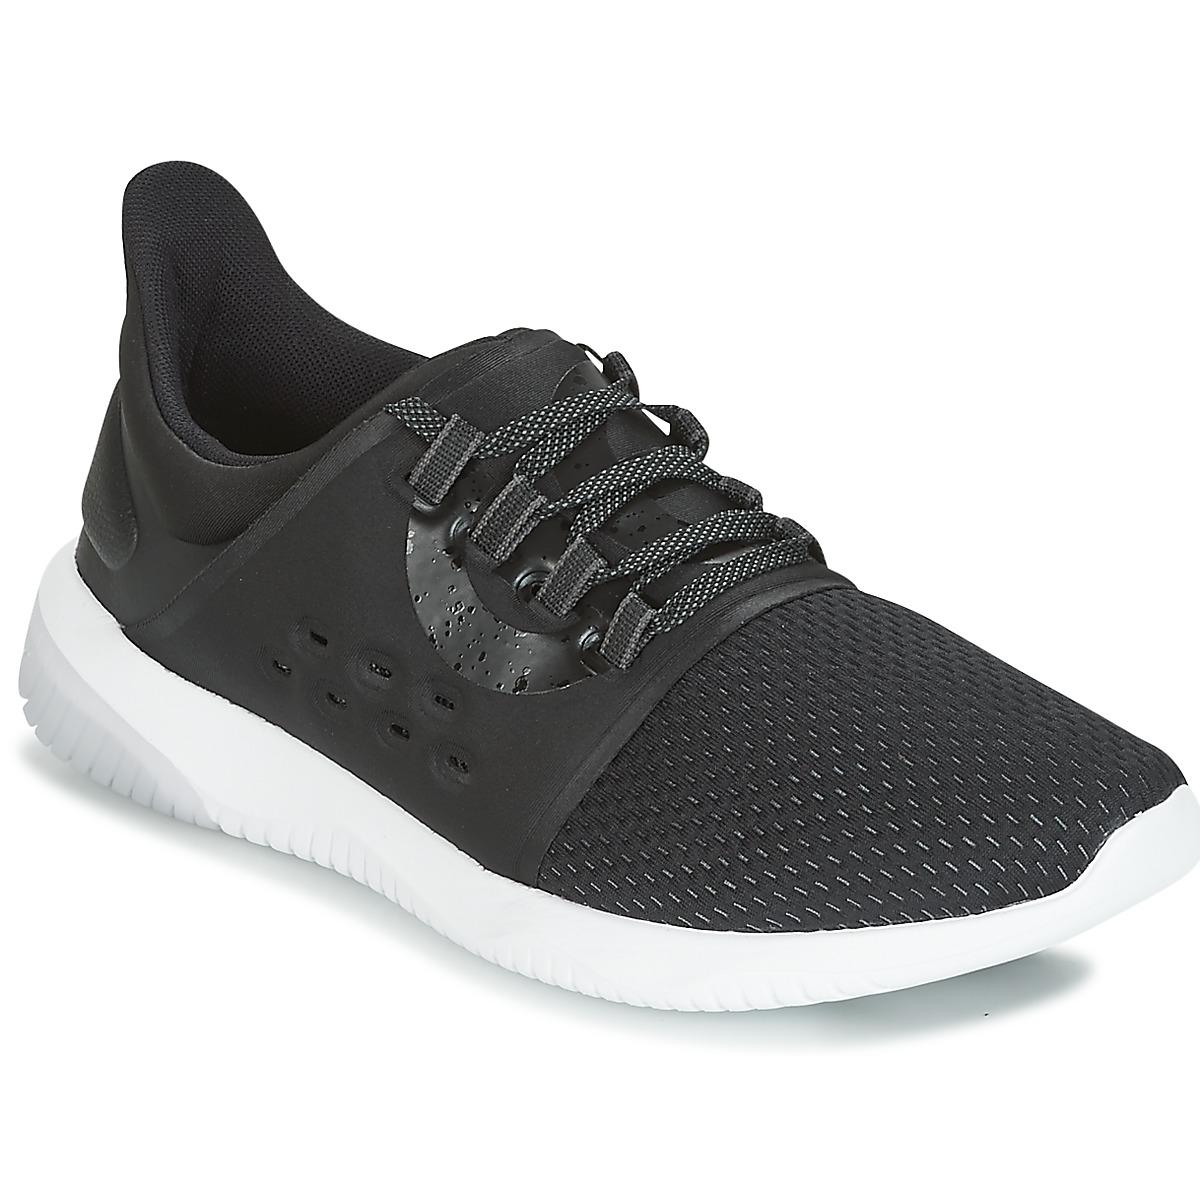 Asics KENUN LYTE Schwarz - Kostenloser Versand bei Spartoode ! - Schuhe Sneaker Low Herren 43,60 €